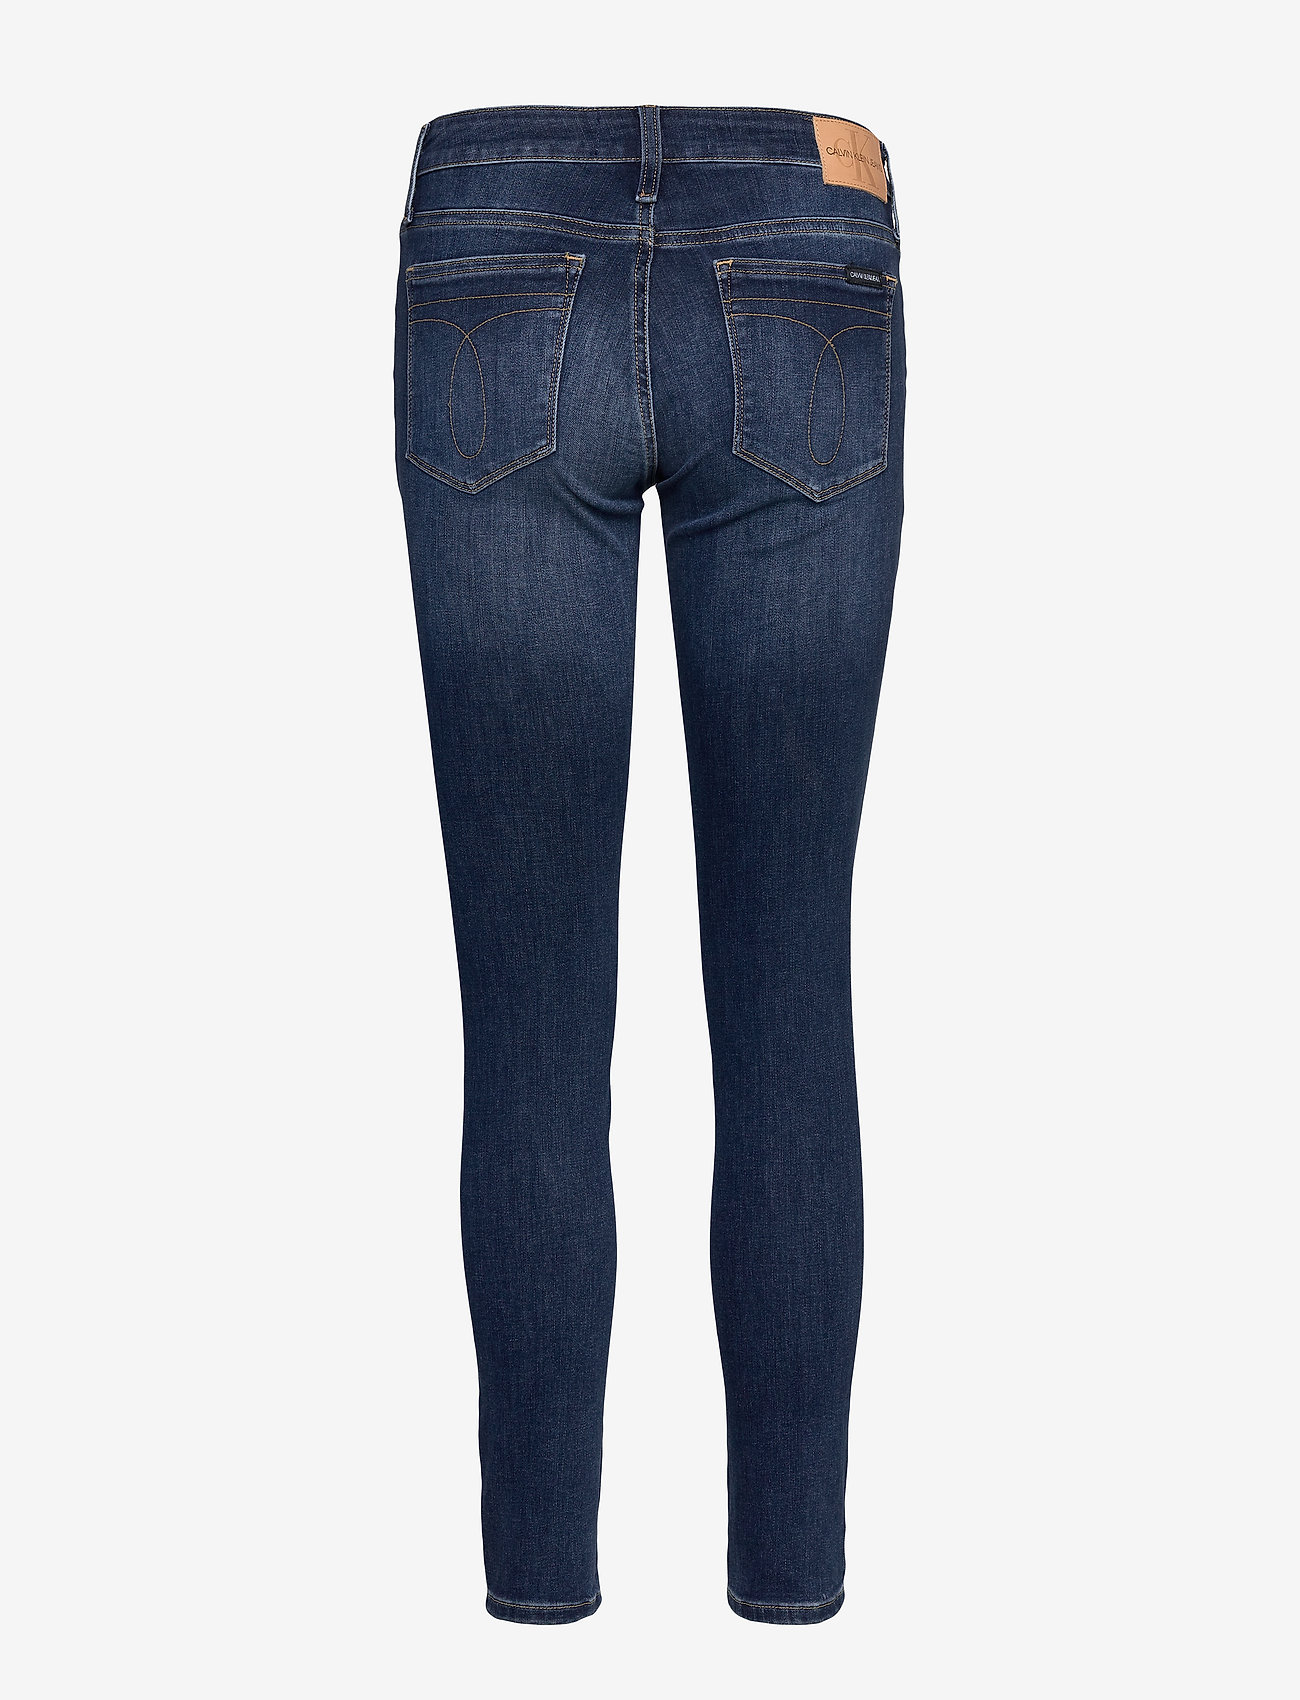 Calvin Klein Jeans - CKJ 011 MID RISE SKINNY - skinny jeans - zz001 mid blue - 1